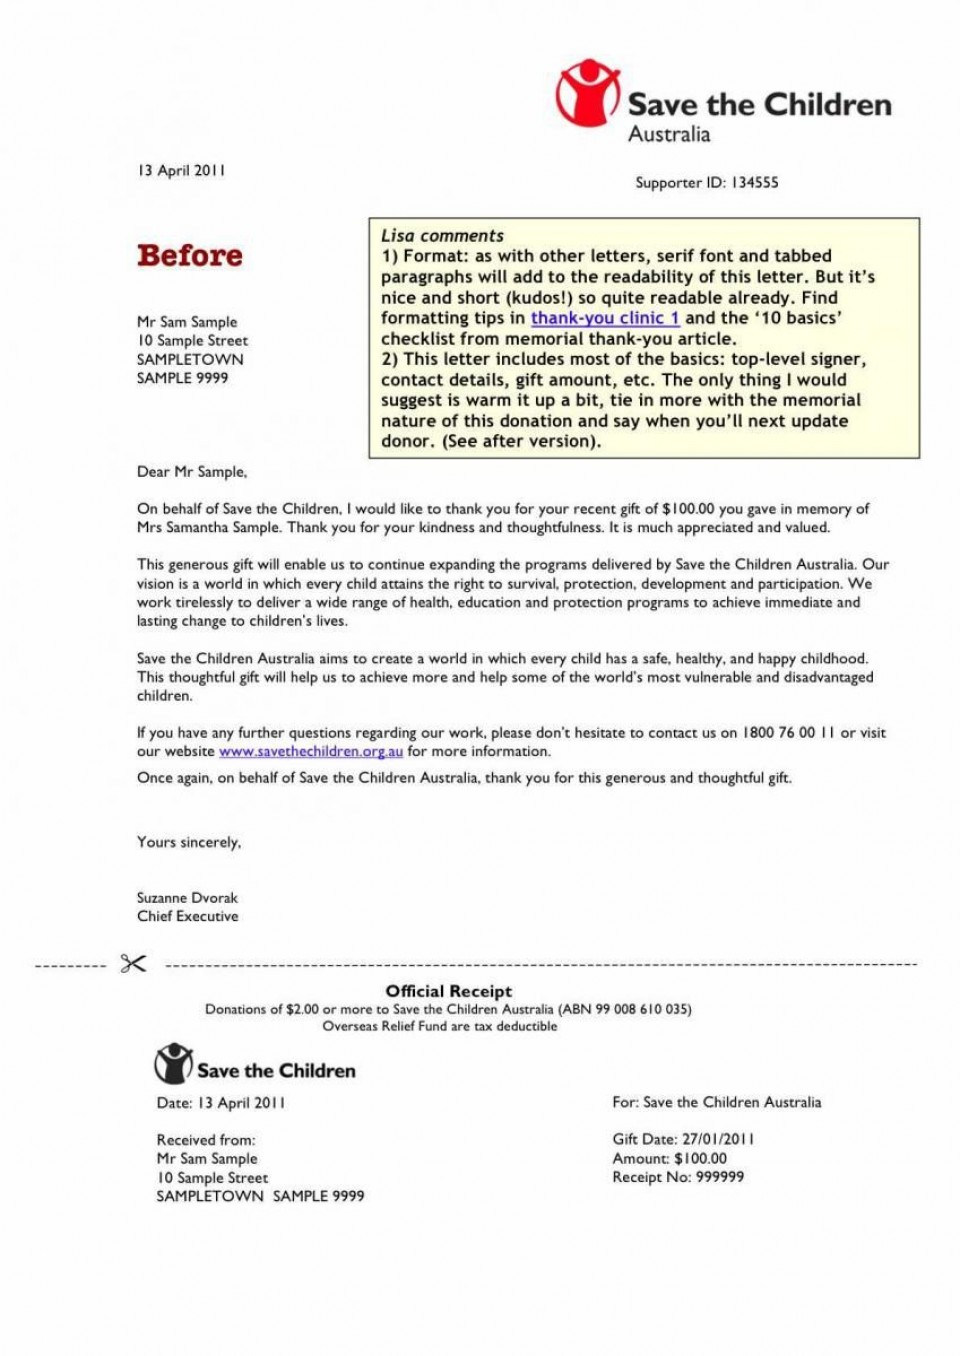 009 Phenomenal Tax Deductible Donation Receipt Template Australia Idea 960